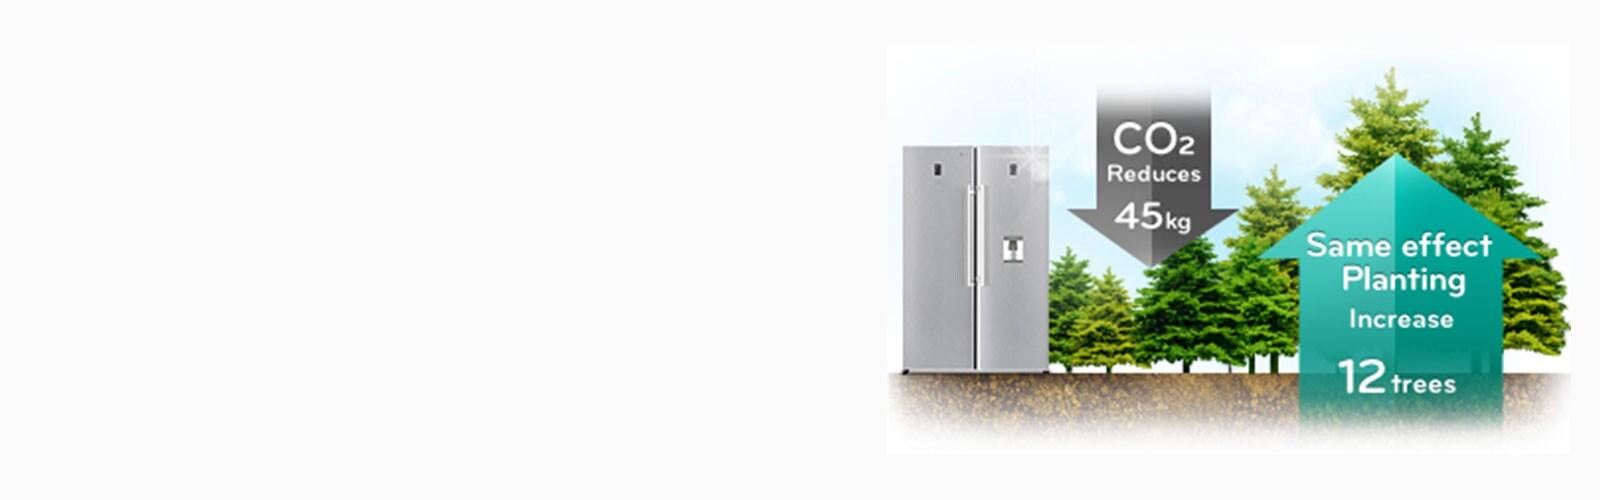 GC-F401ELDZ_lg-refrigerator-lansen-feature_Eco_Friendly_D_11072019